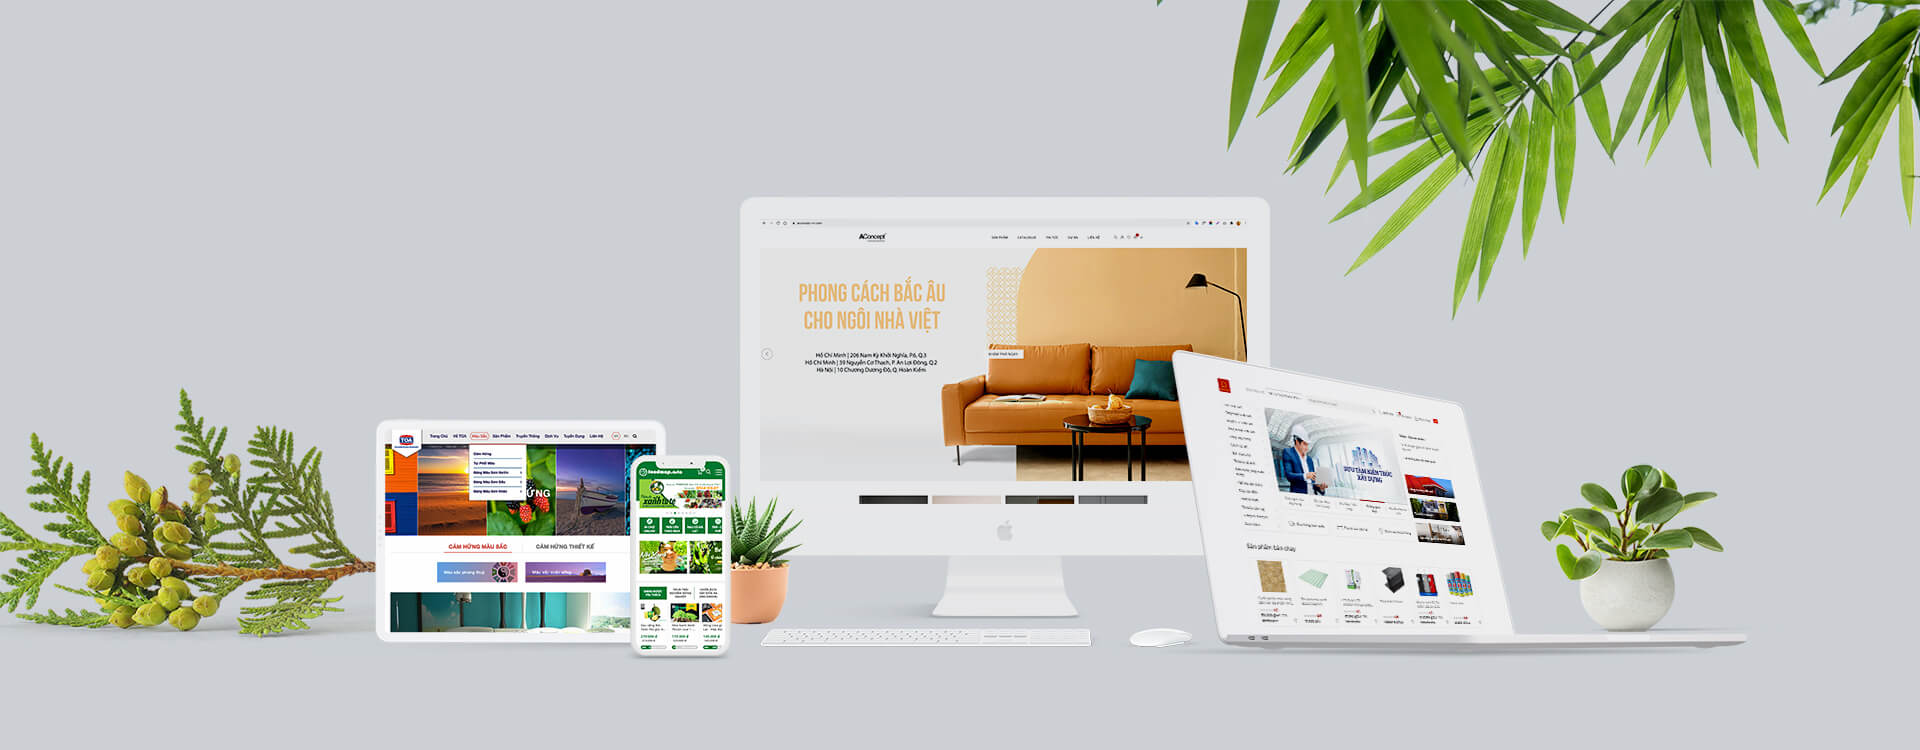 web-redesign-mga-hinh